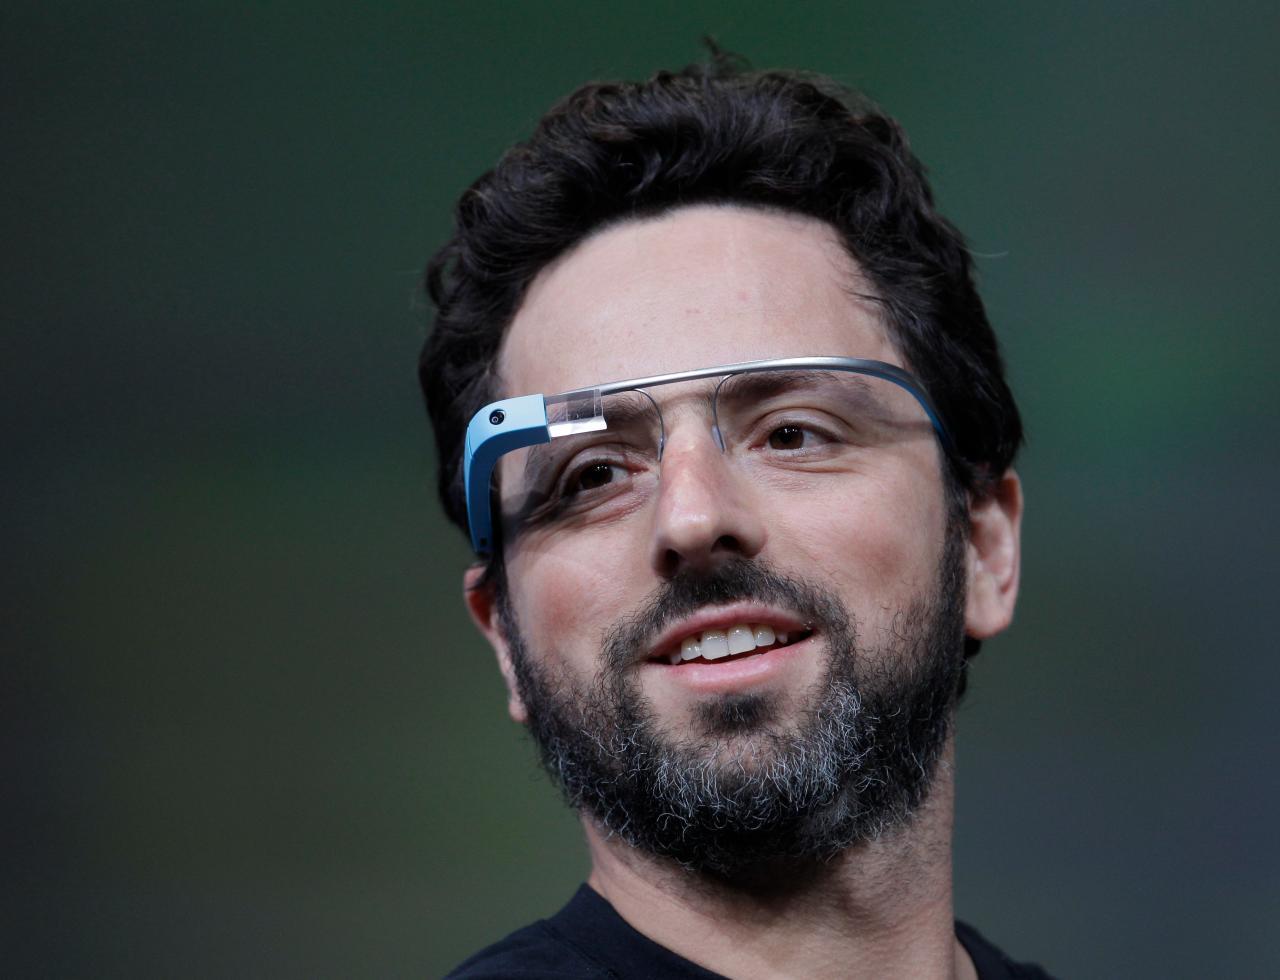 Sergey Brinn with his Google Glass.